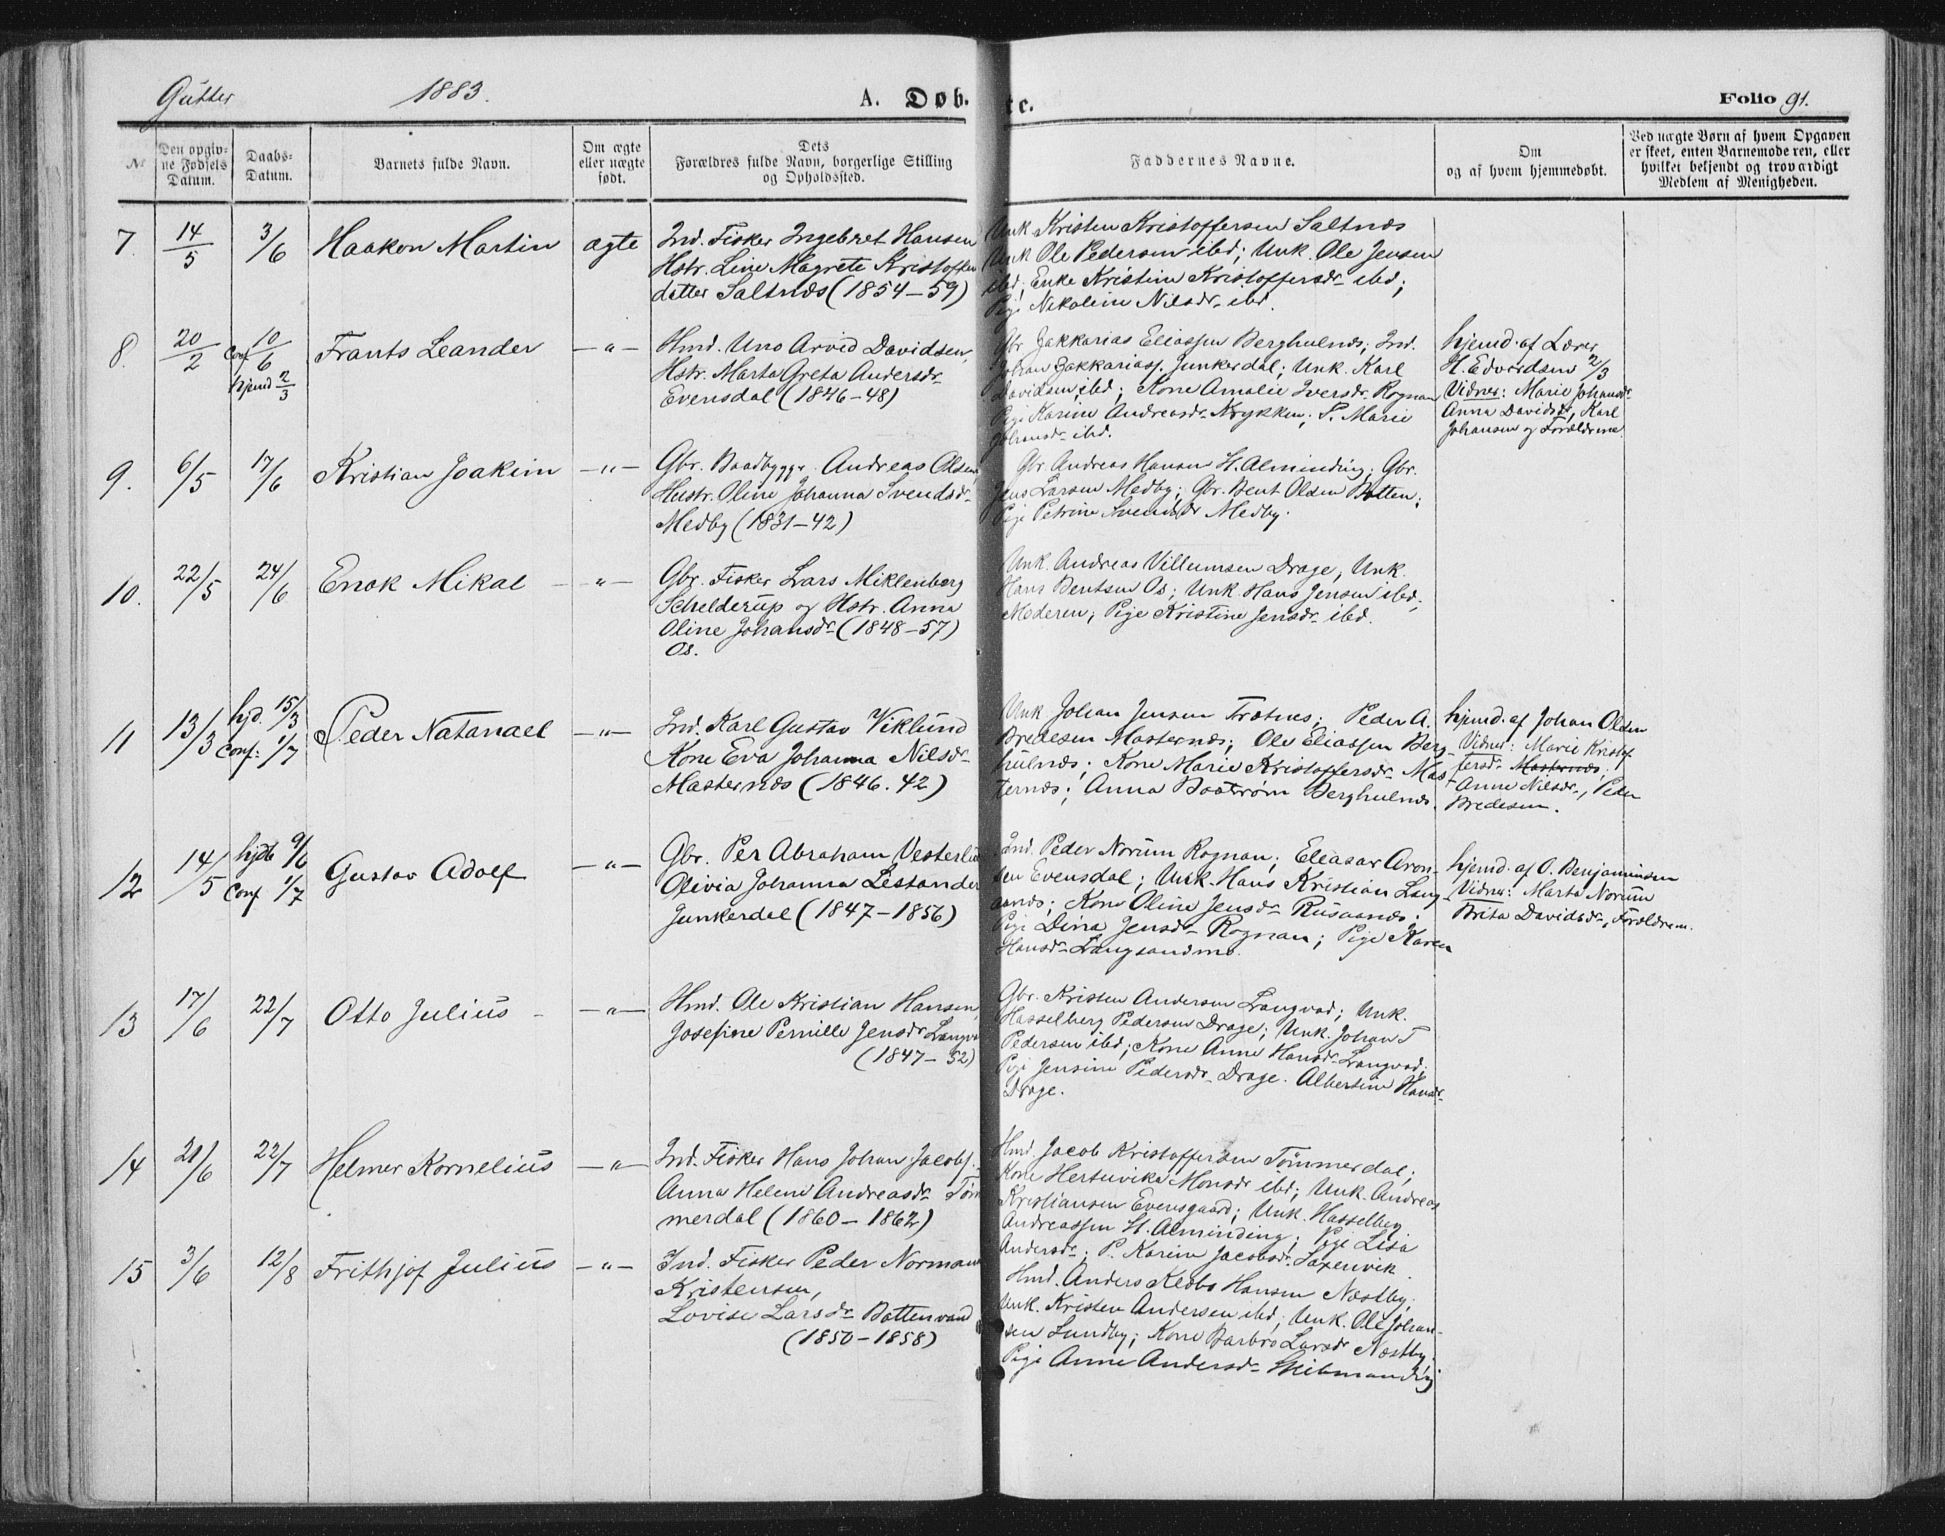 SAT, Ministerialprotokoller, klokkerbøker og fødselsregistre - Nordland, 847/L0668: Ministerialbok nr. 847A08, 1872-1886, s. 91